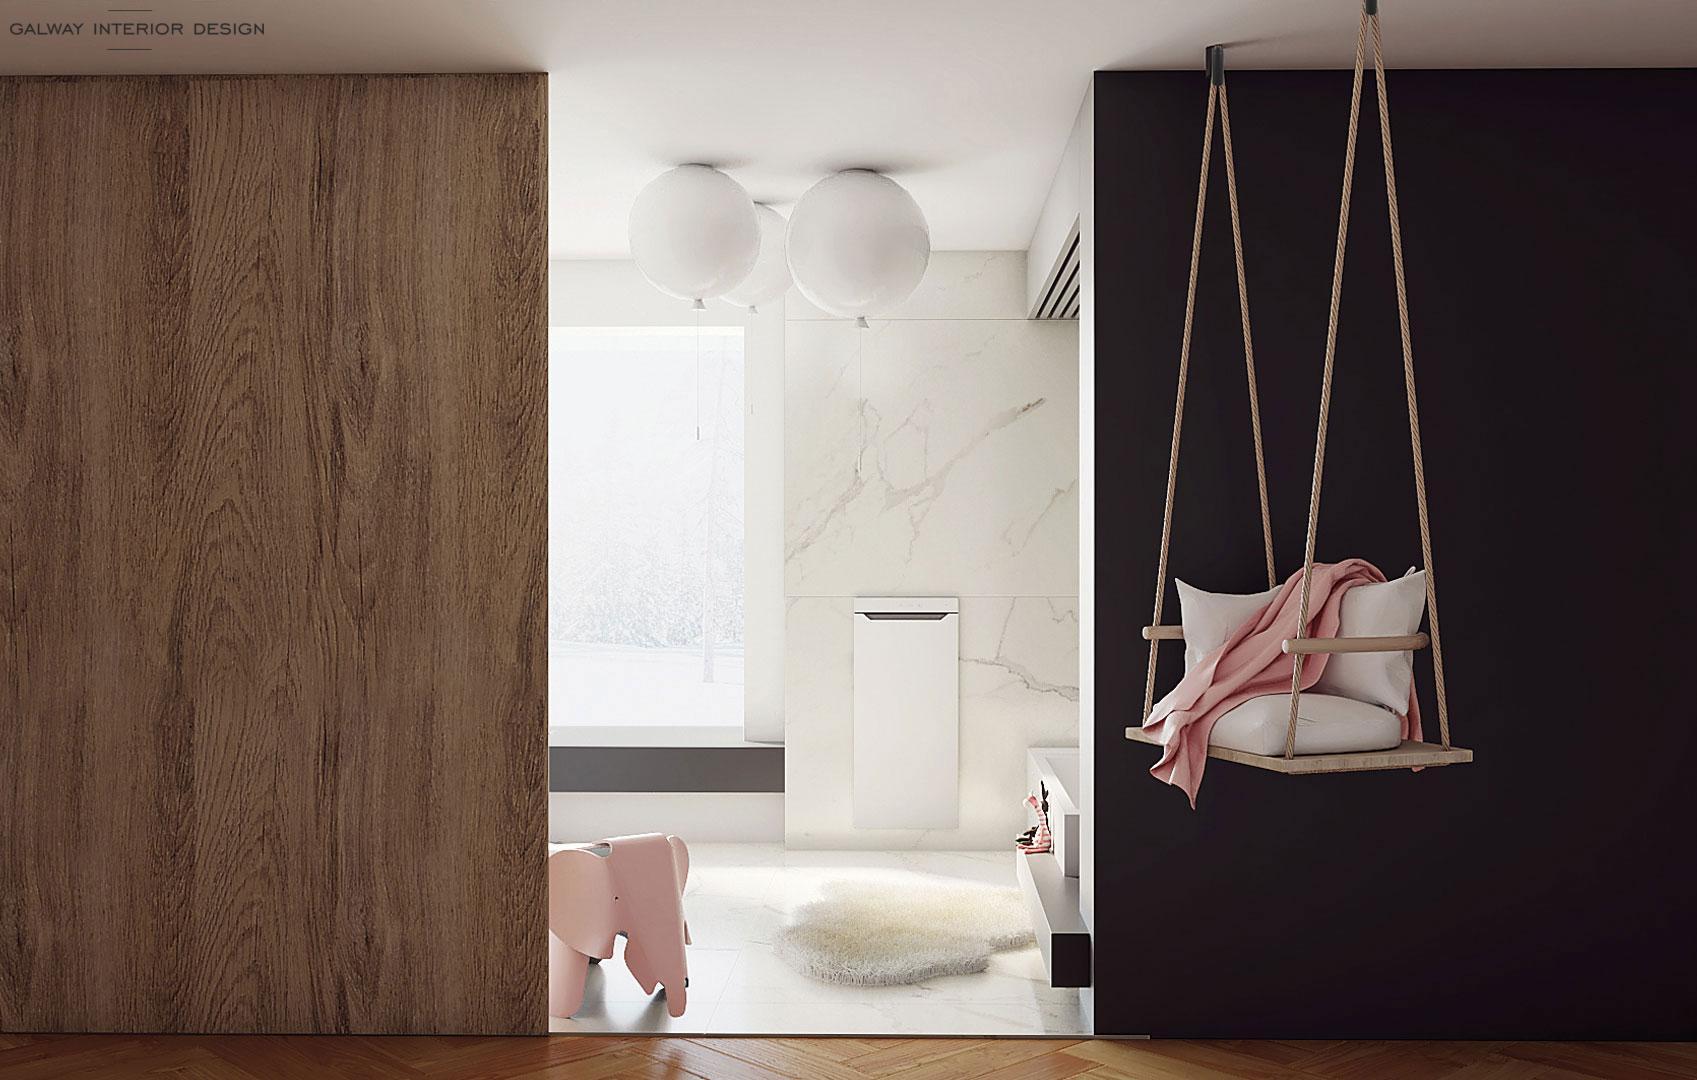 Galway Interior Design - Kids Bathroom Idea